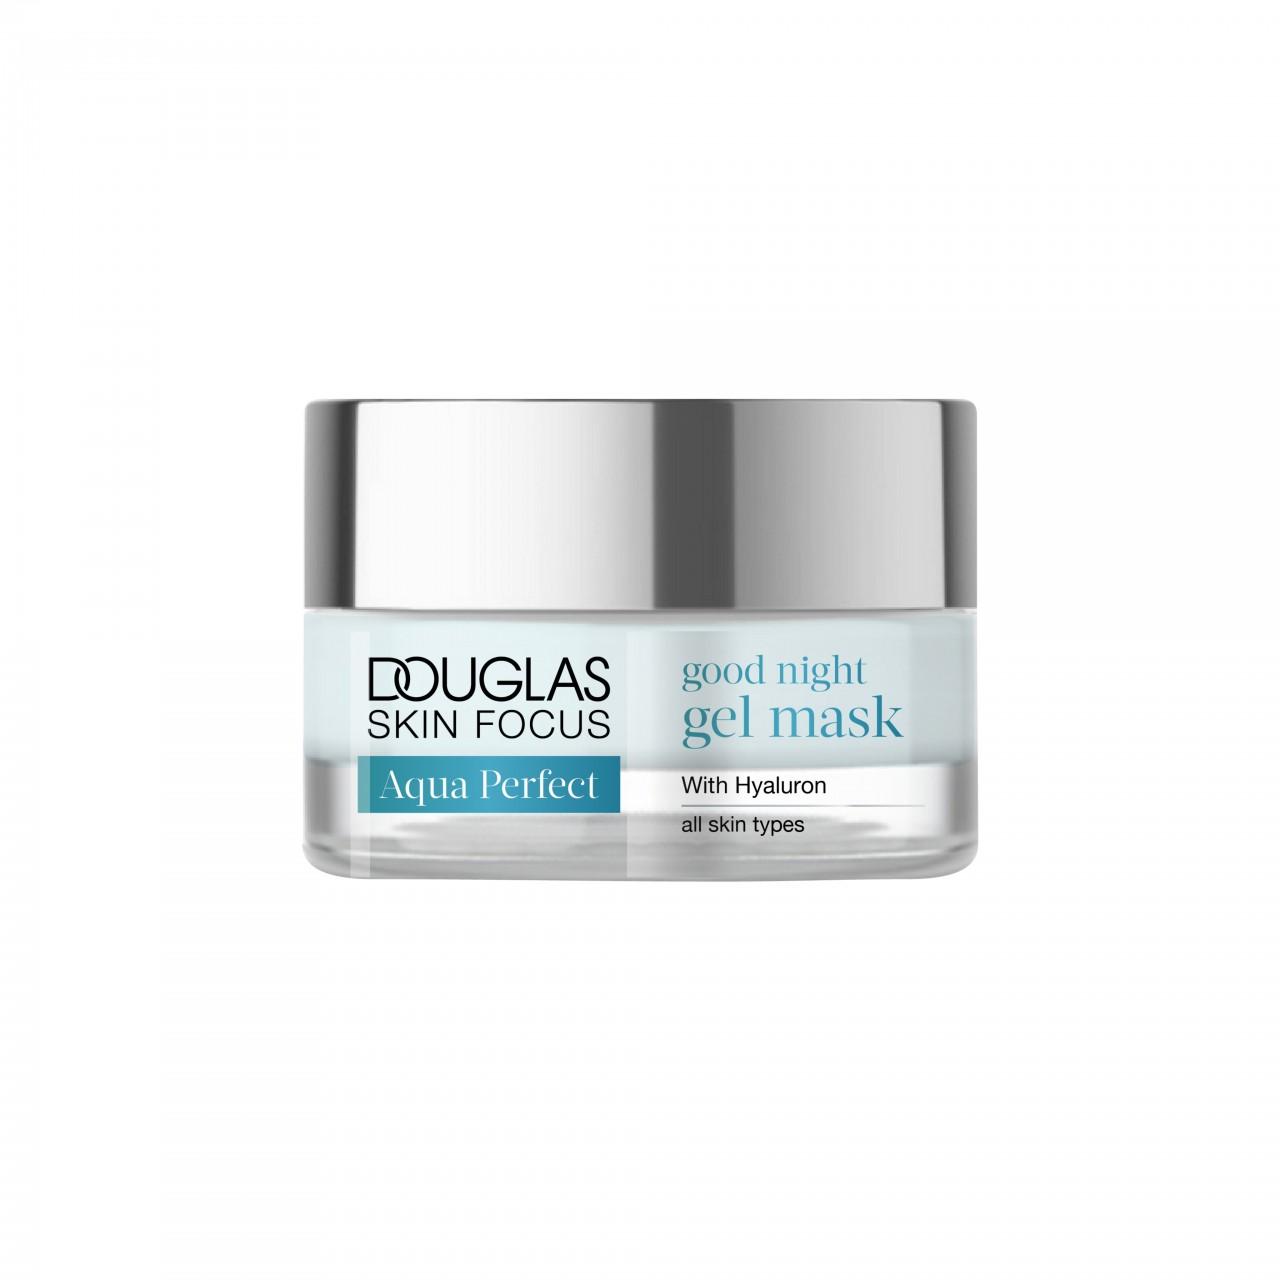 Douglas Focus Good Night Gel Mask